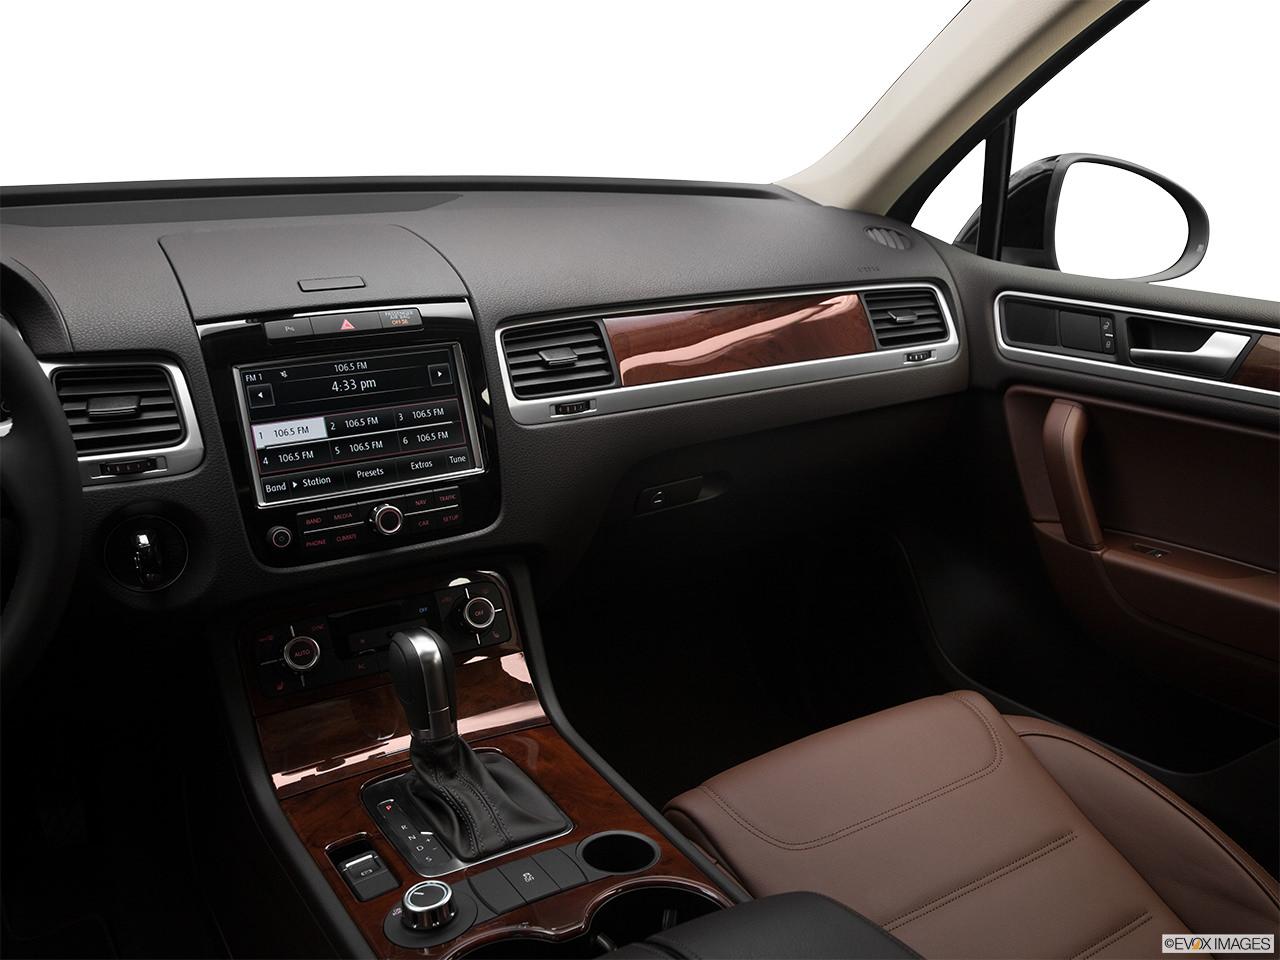 Volkswagen Touareg 2012 Interior